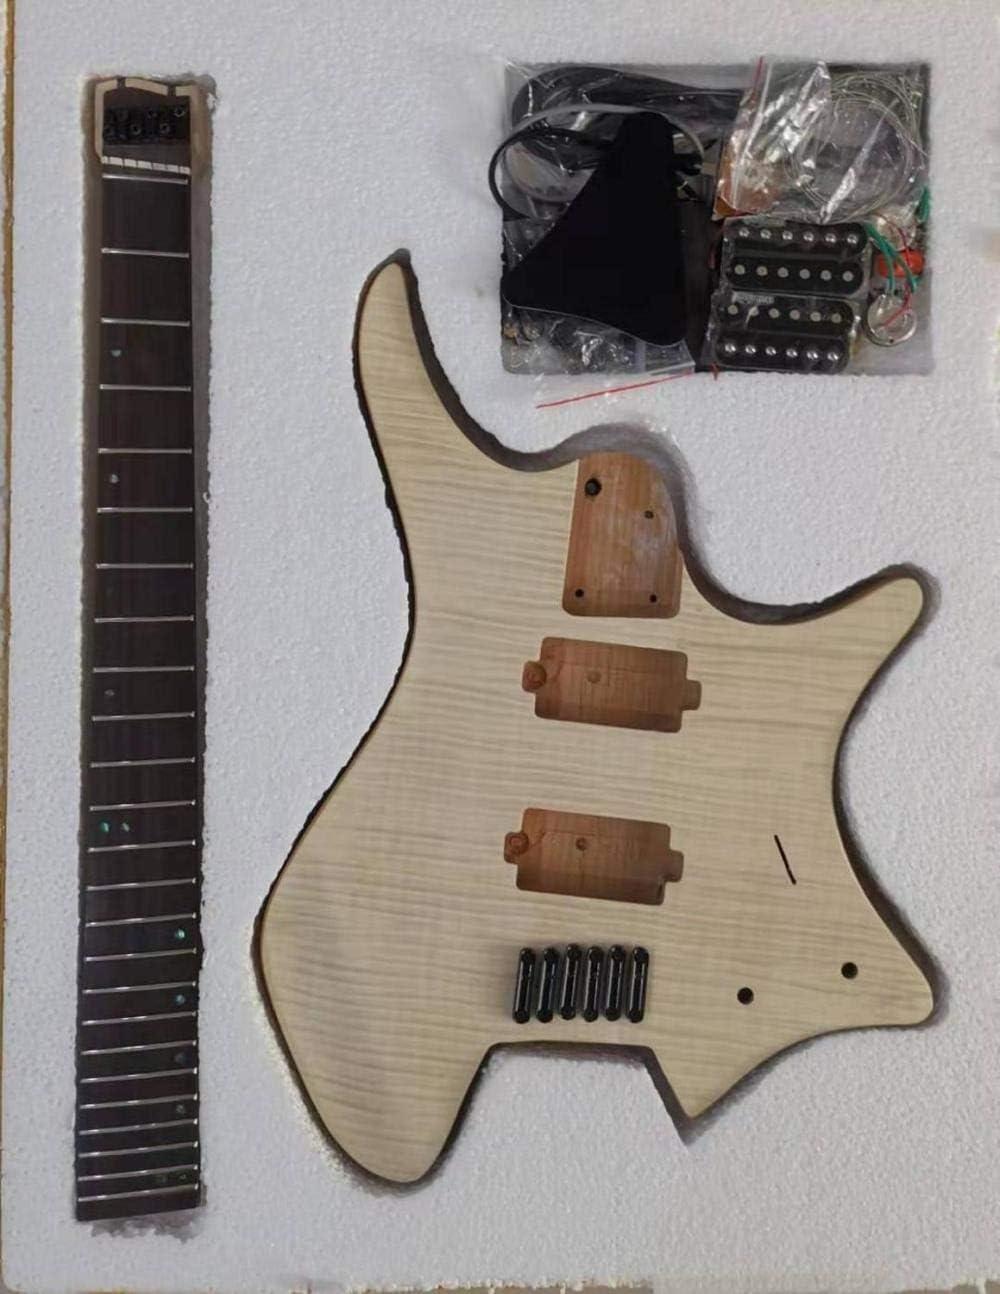 Japan Maker New LYNLYN Guitars Guitar Pick Mountain Sacramento Mall Headless semi-Finish